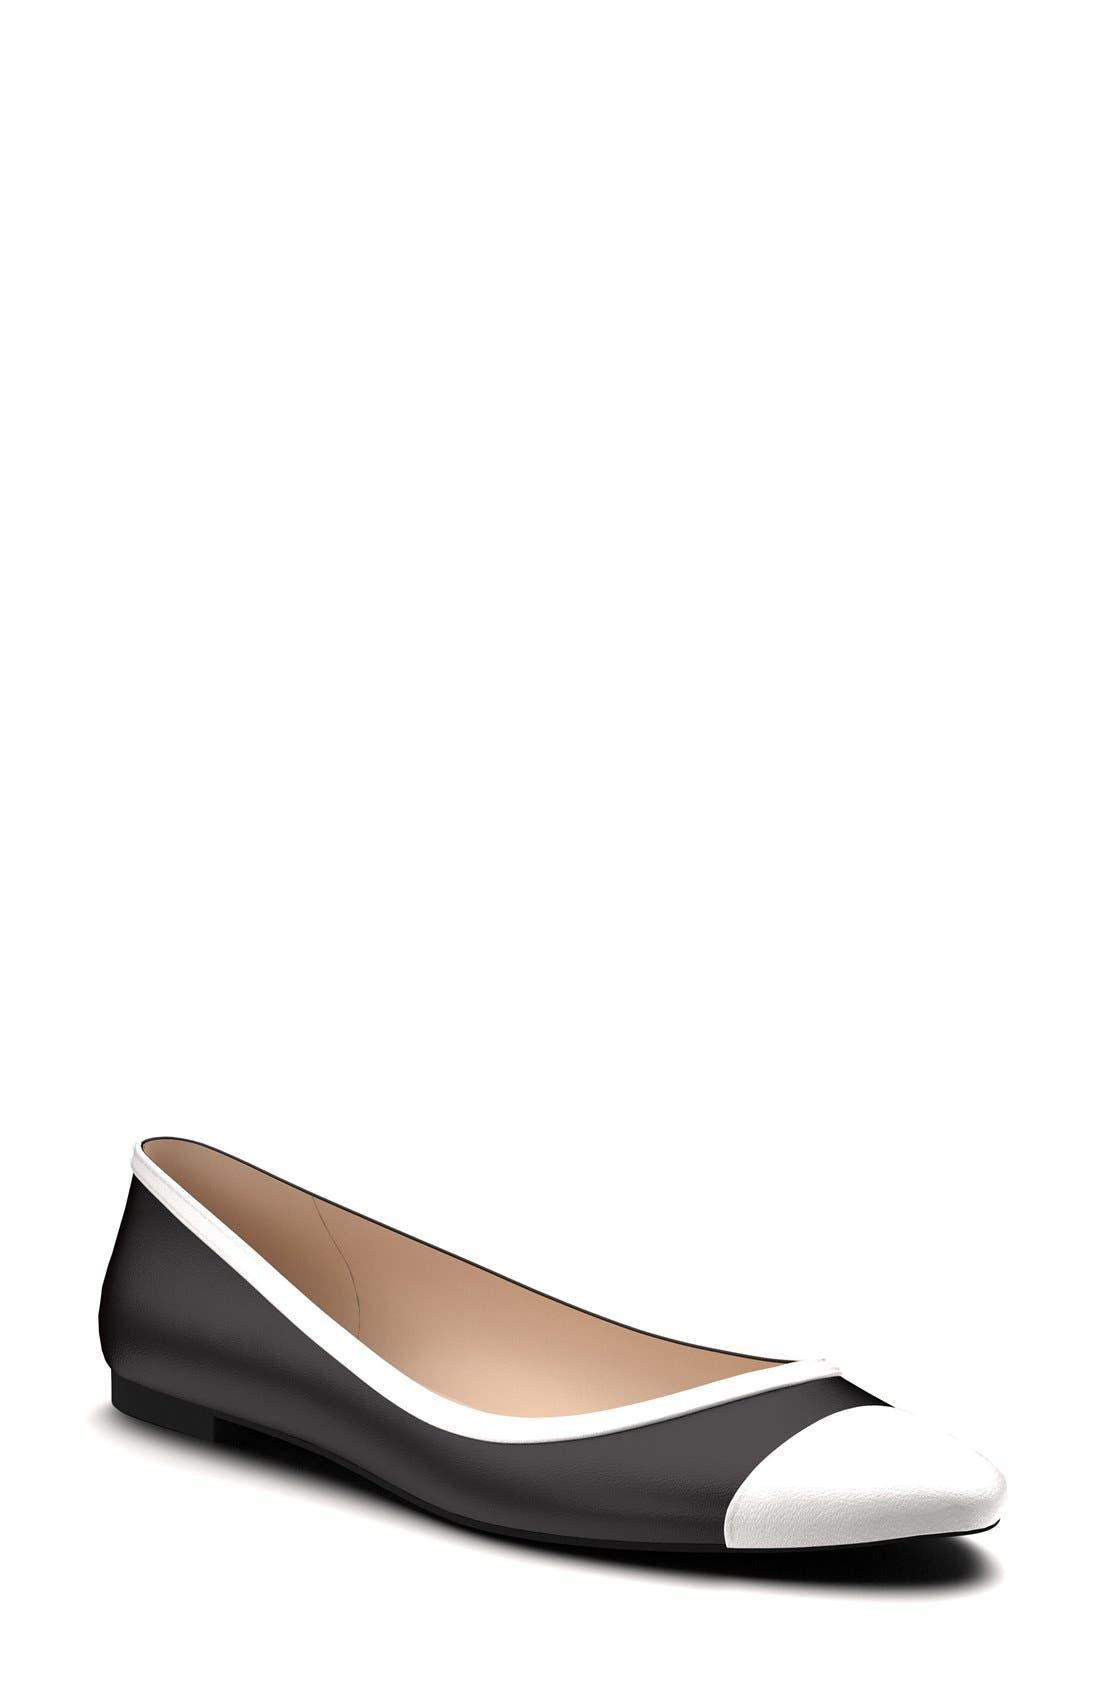 Shoes of Prey Cap Toe Flat (Women)